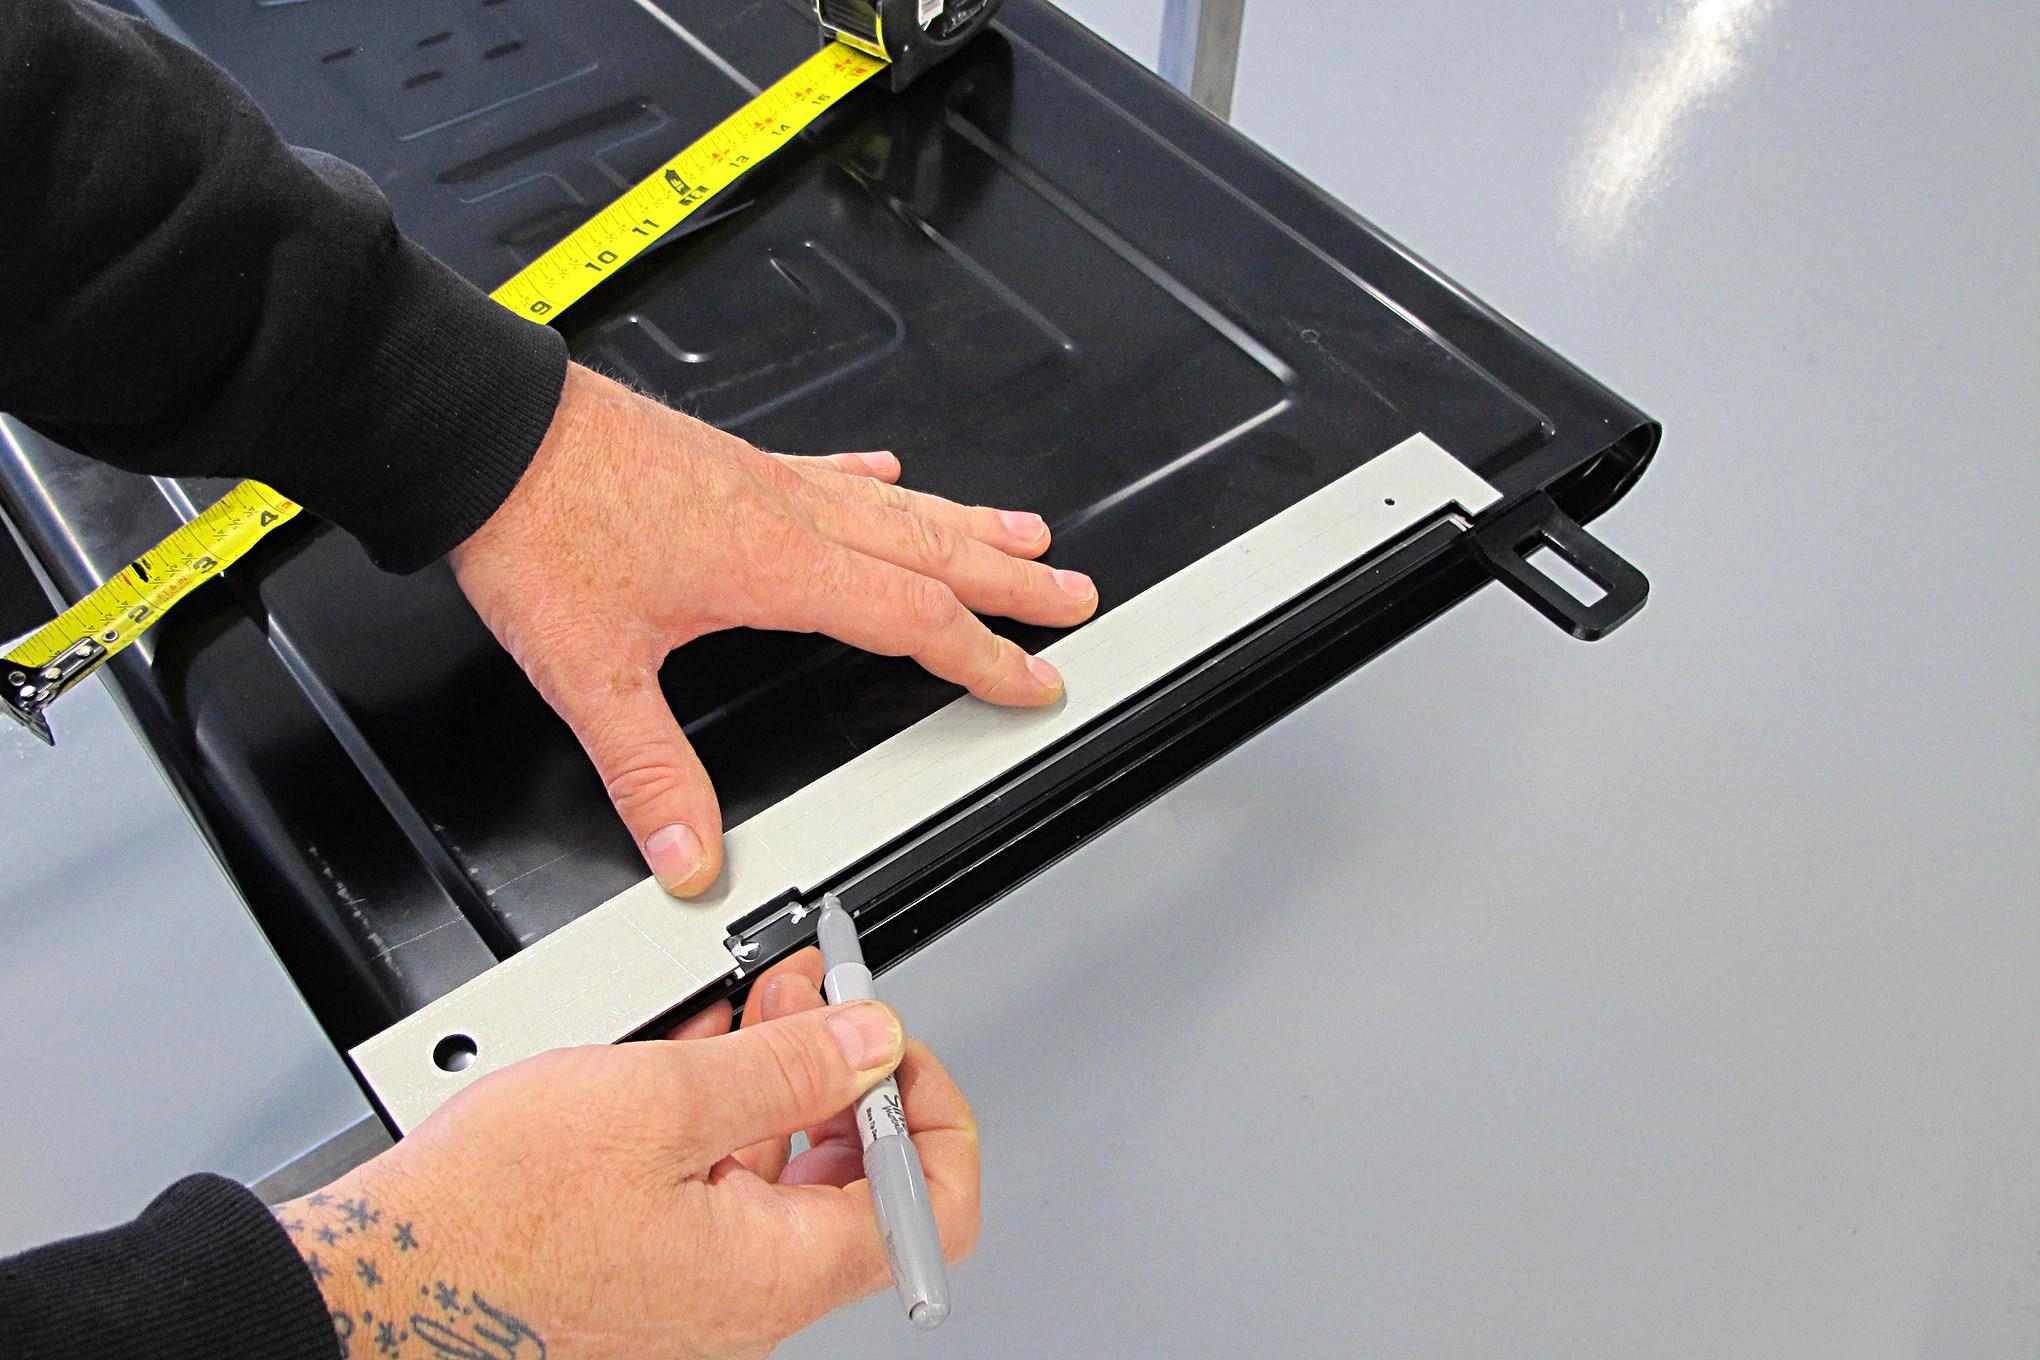 06-CLTP-170100-chevy-stepside-hidden-tailgate-latch-install.JPG